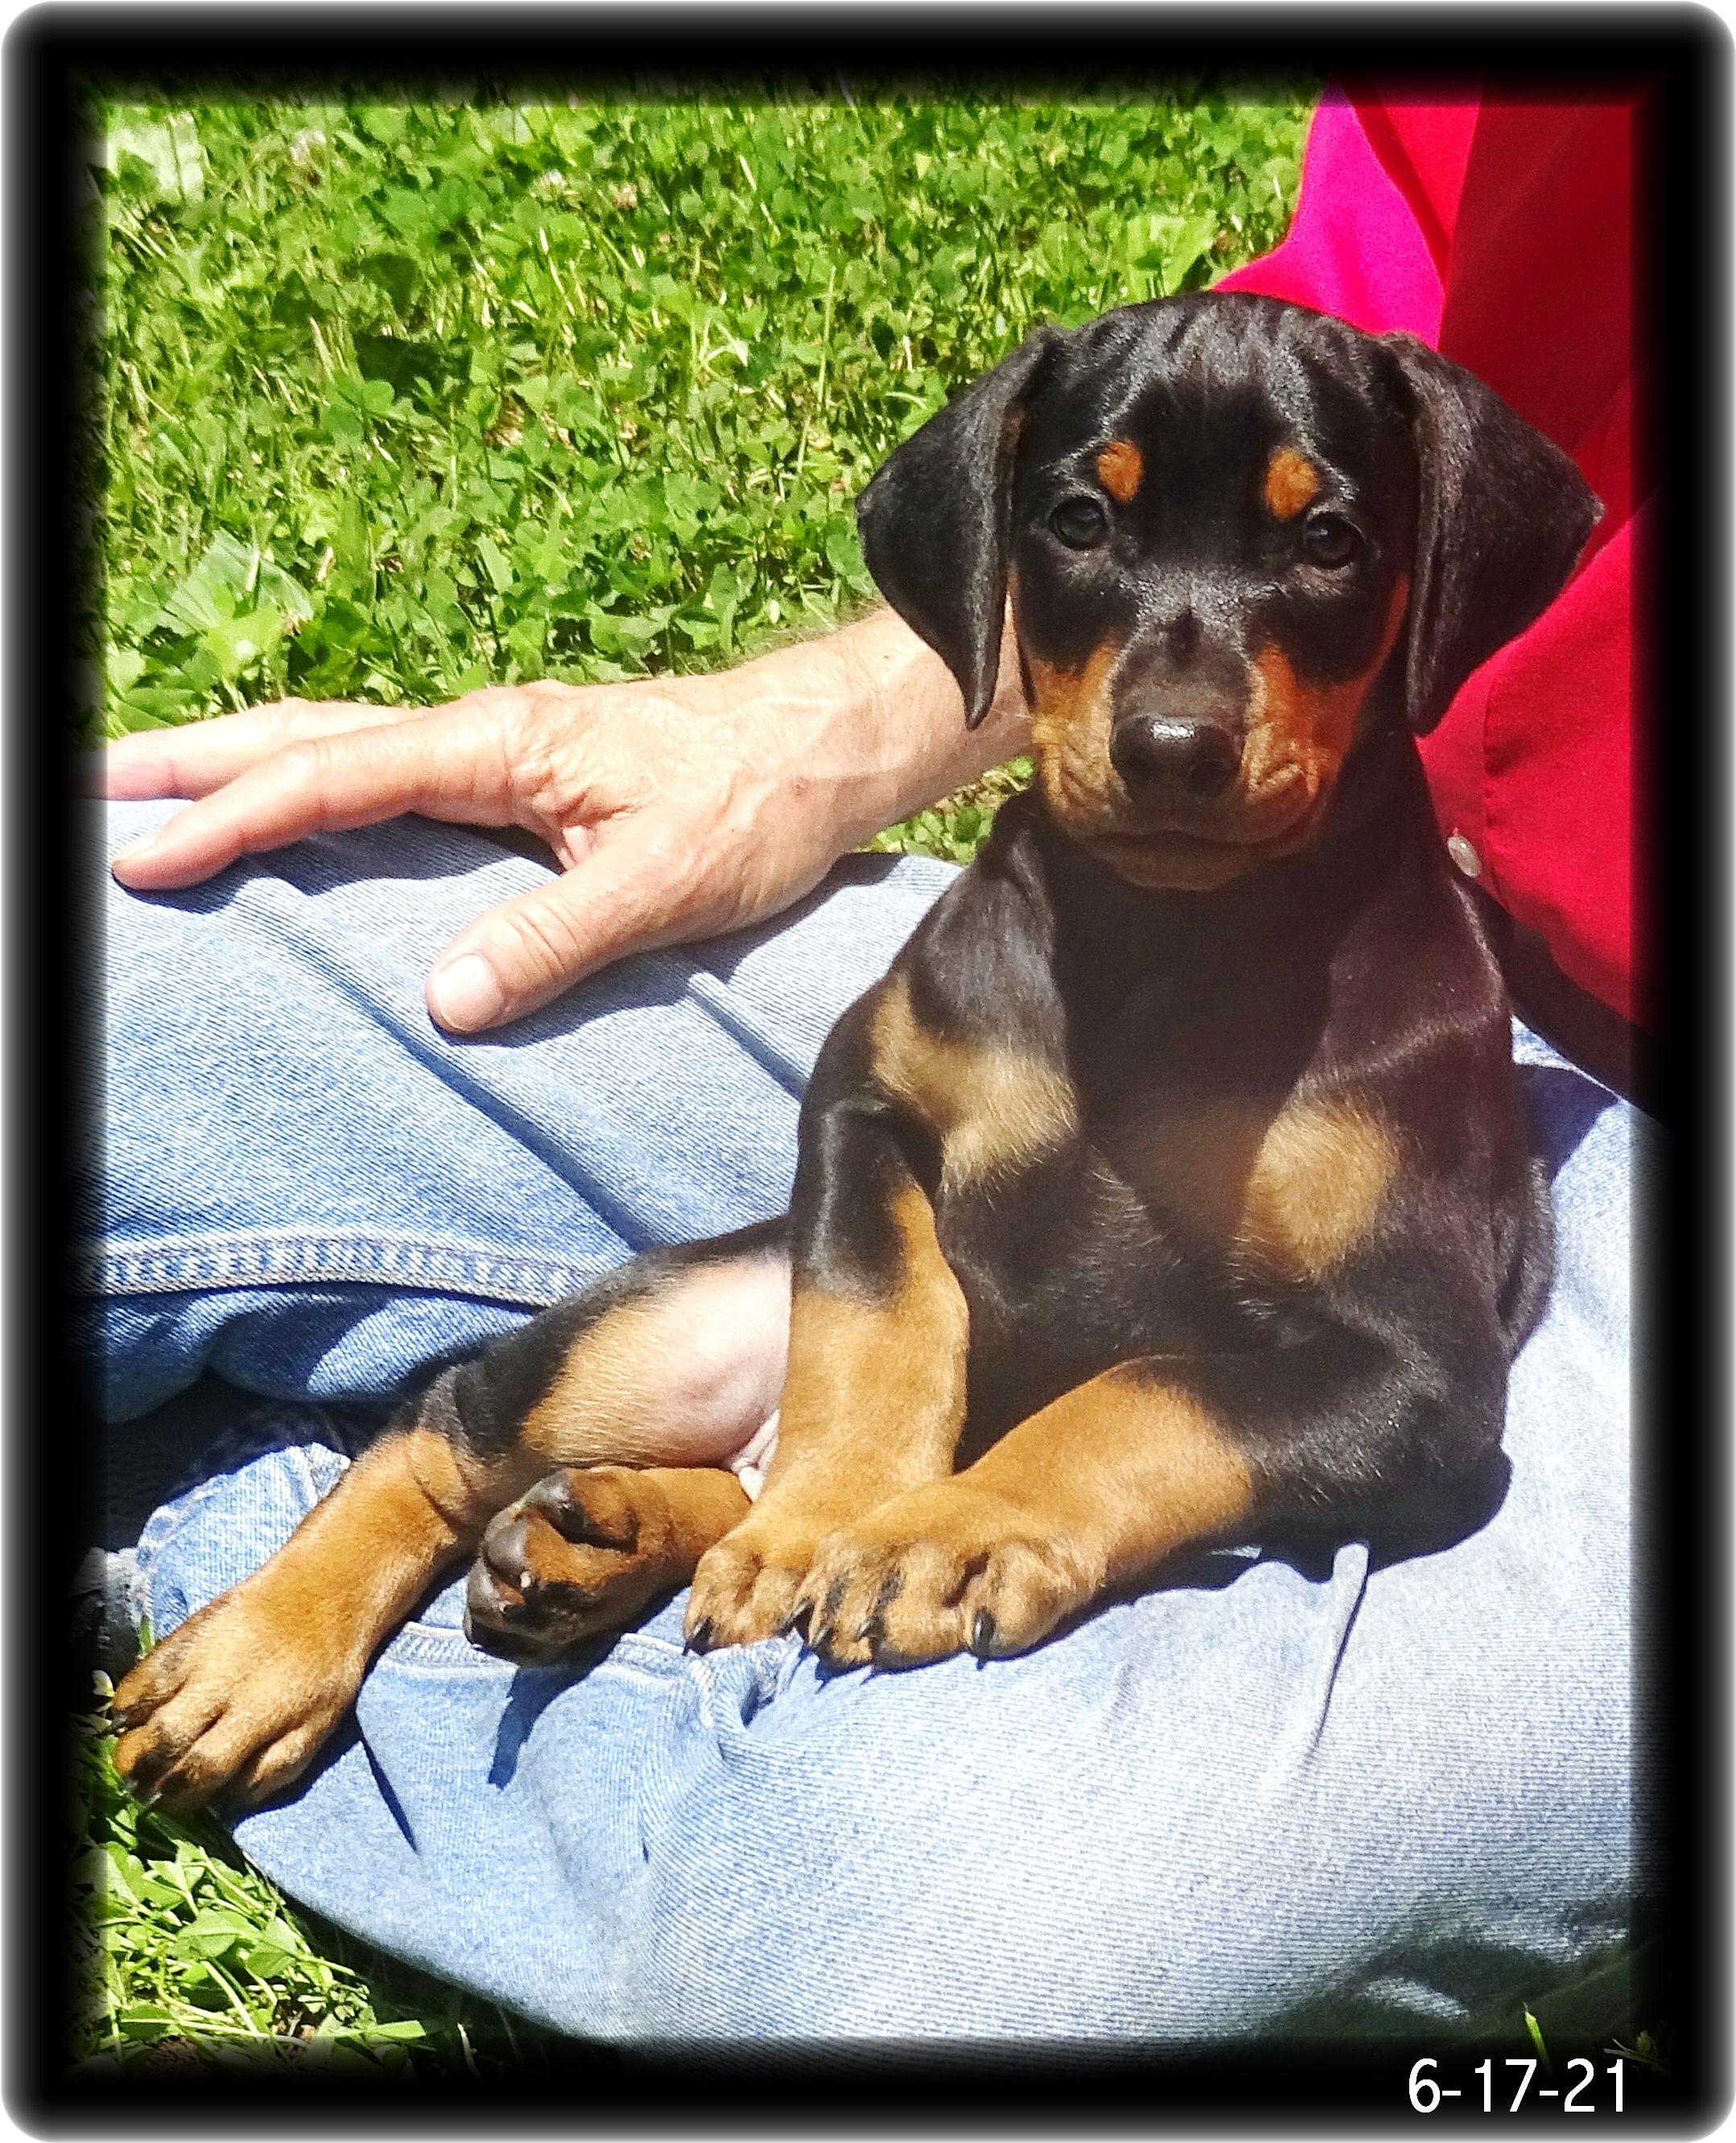 miska-s-pup-baby-kodiak-first-formal-outside-6-16-21-098.jpg